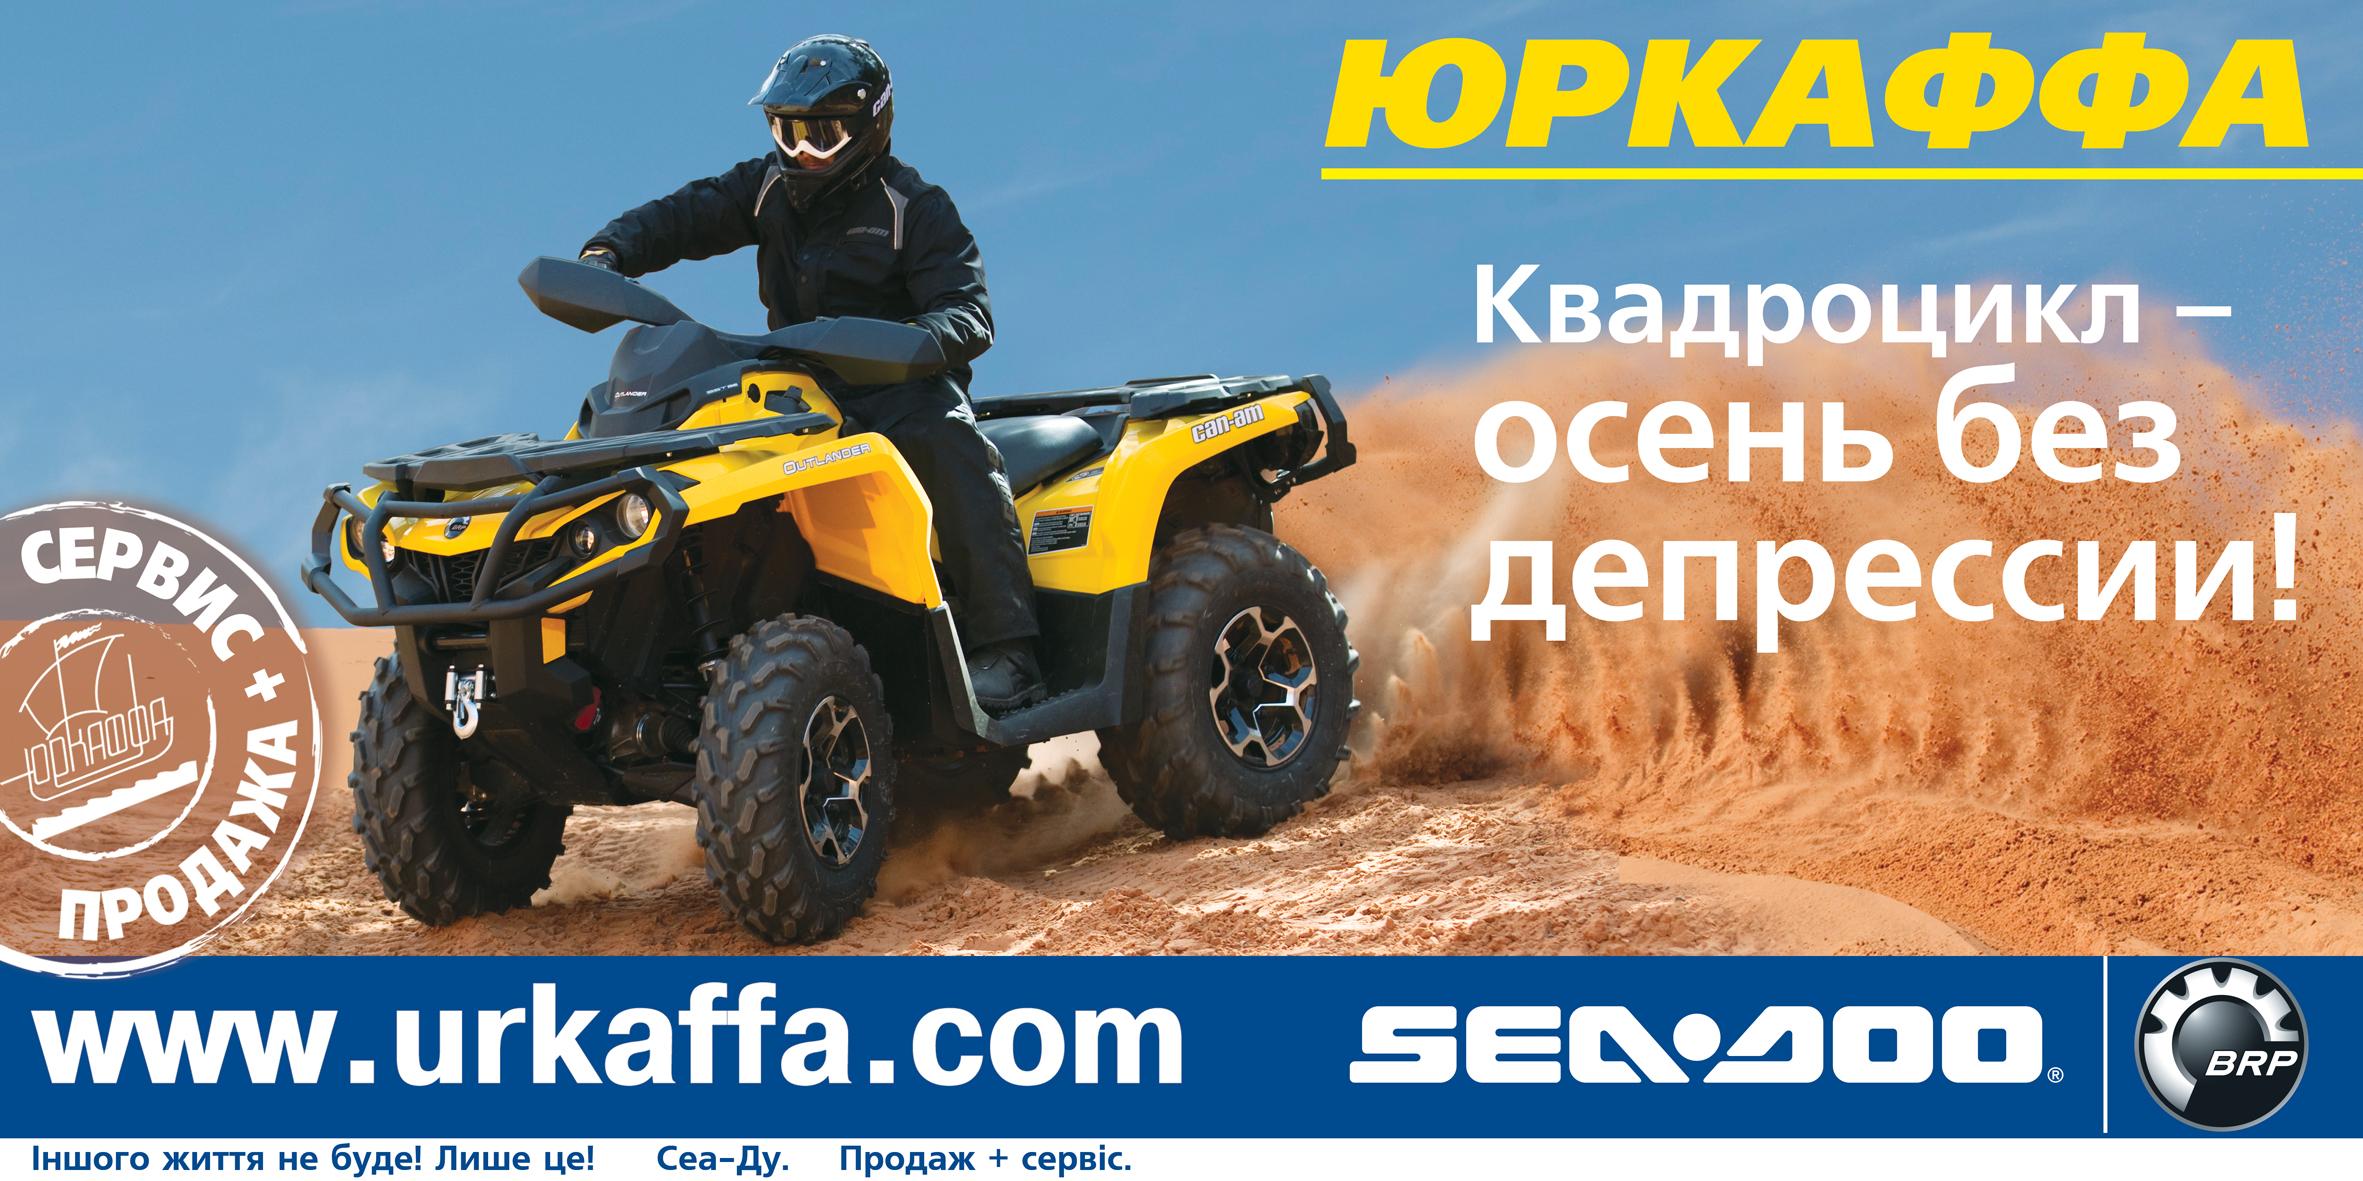 Bigbord_Sae_Doo_Kvadrocikl_UKR copy.jpg